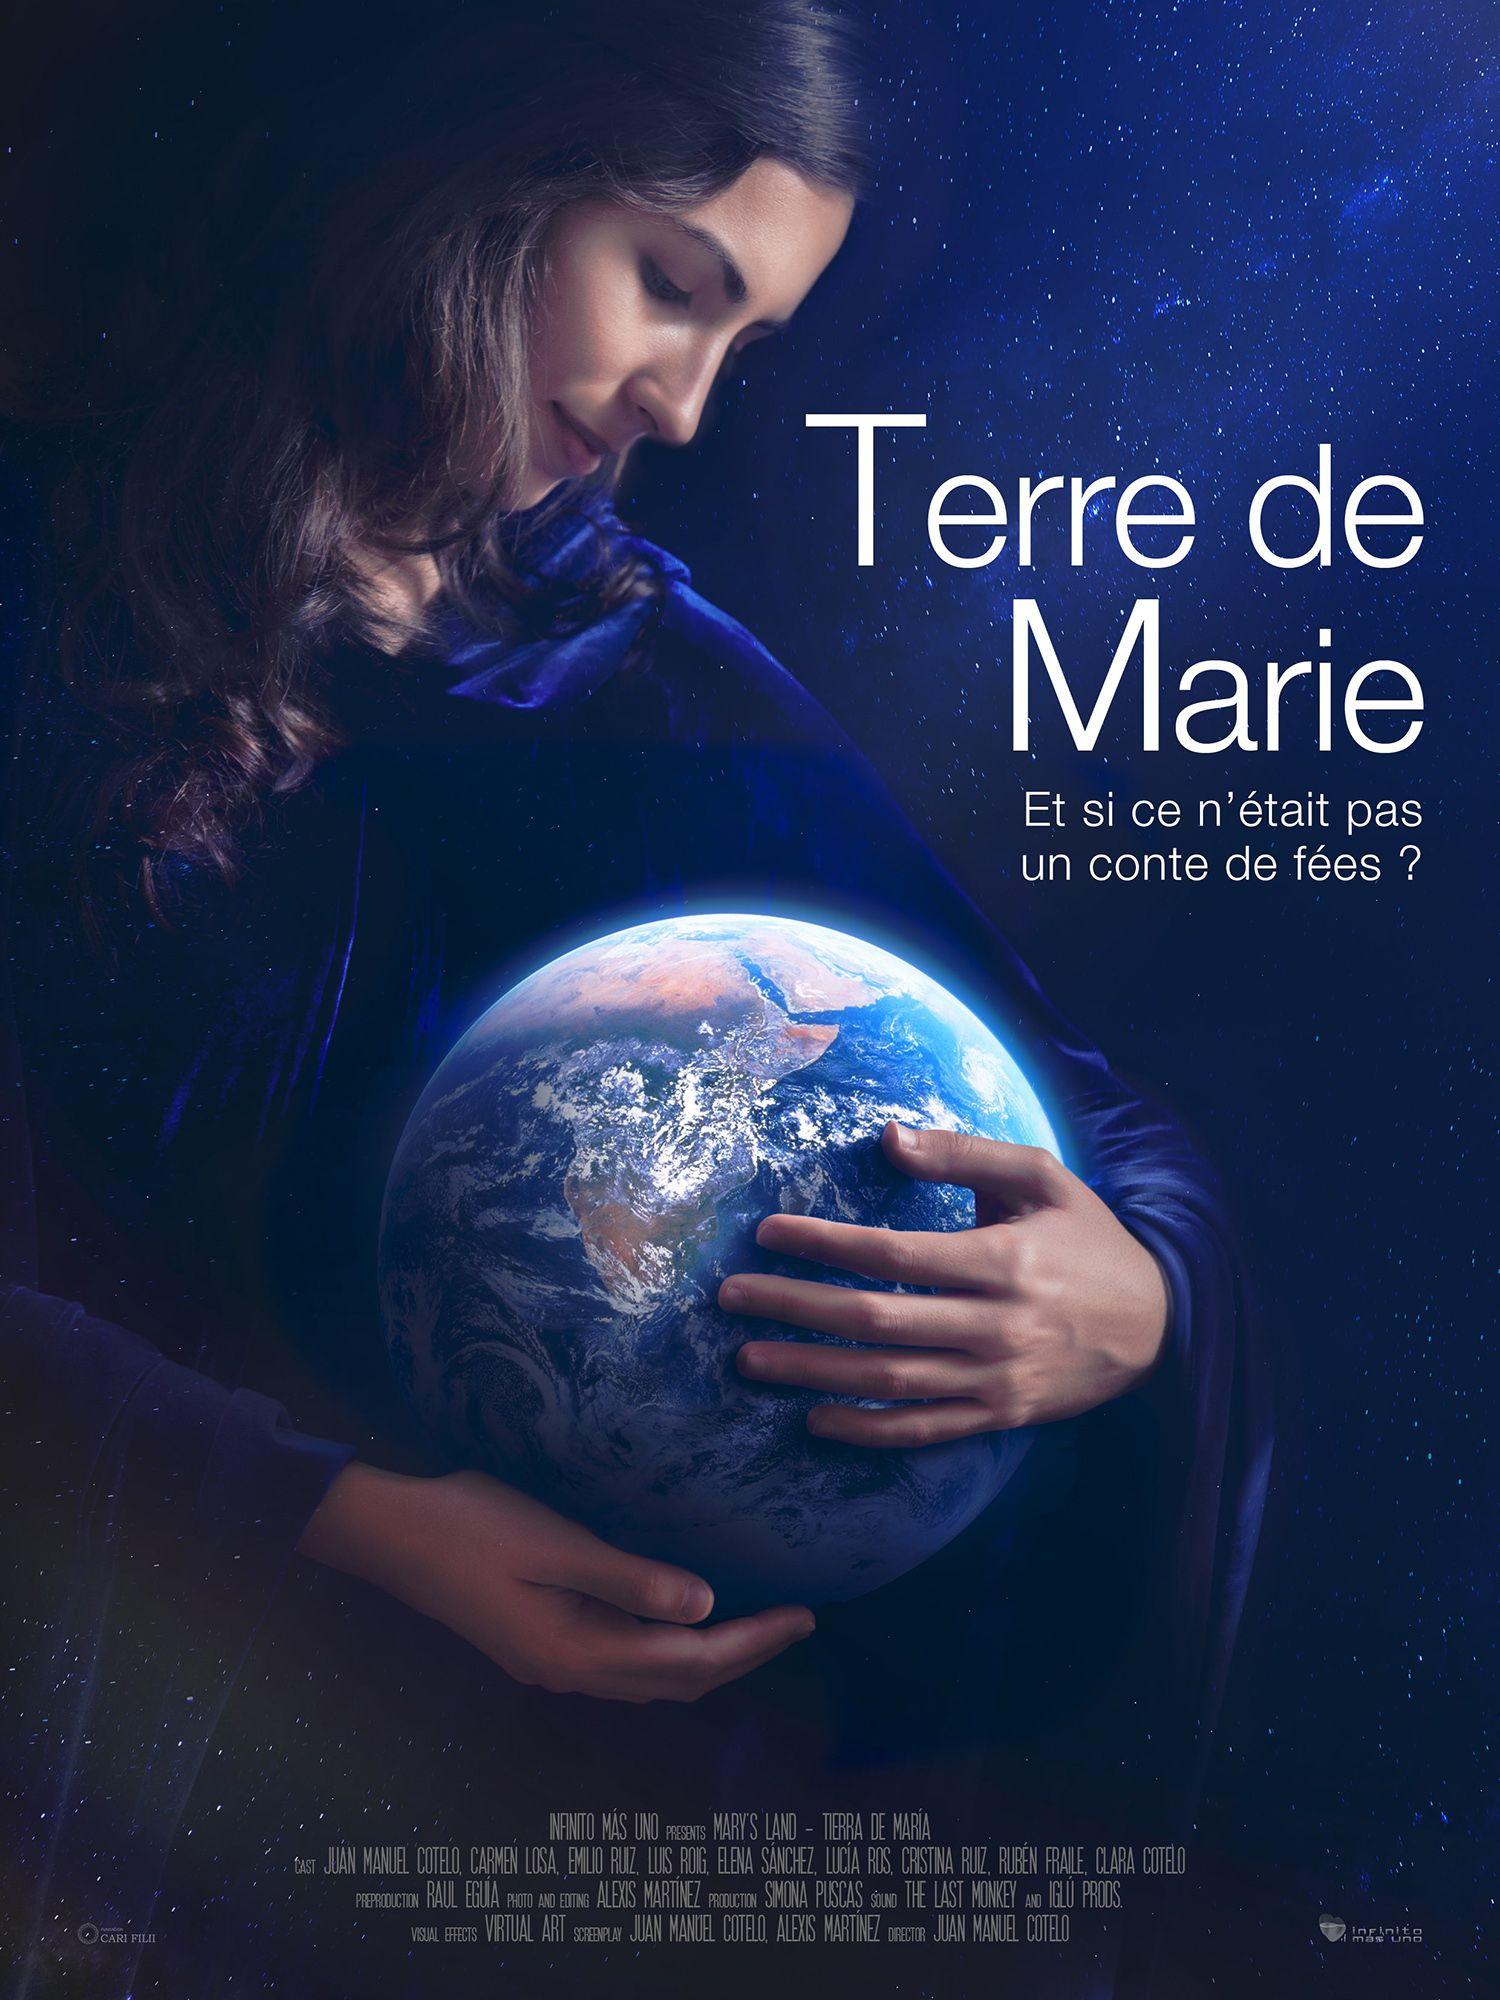 Terre de Marie - Documentaire (2013)